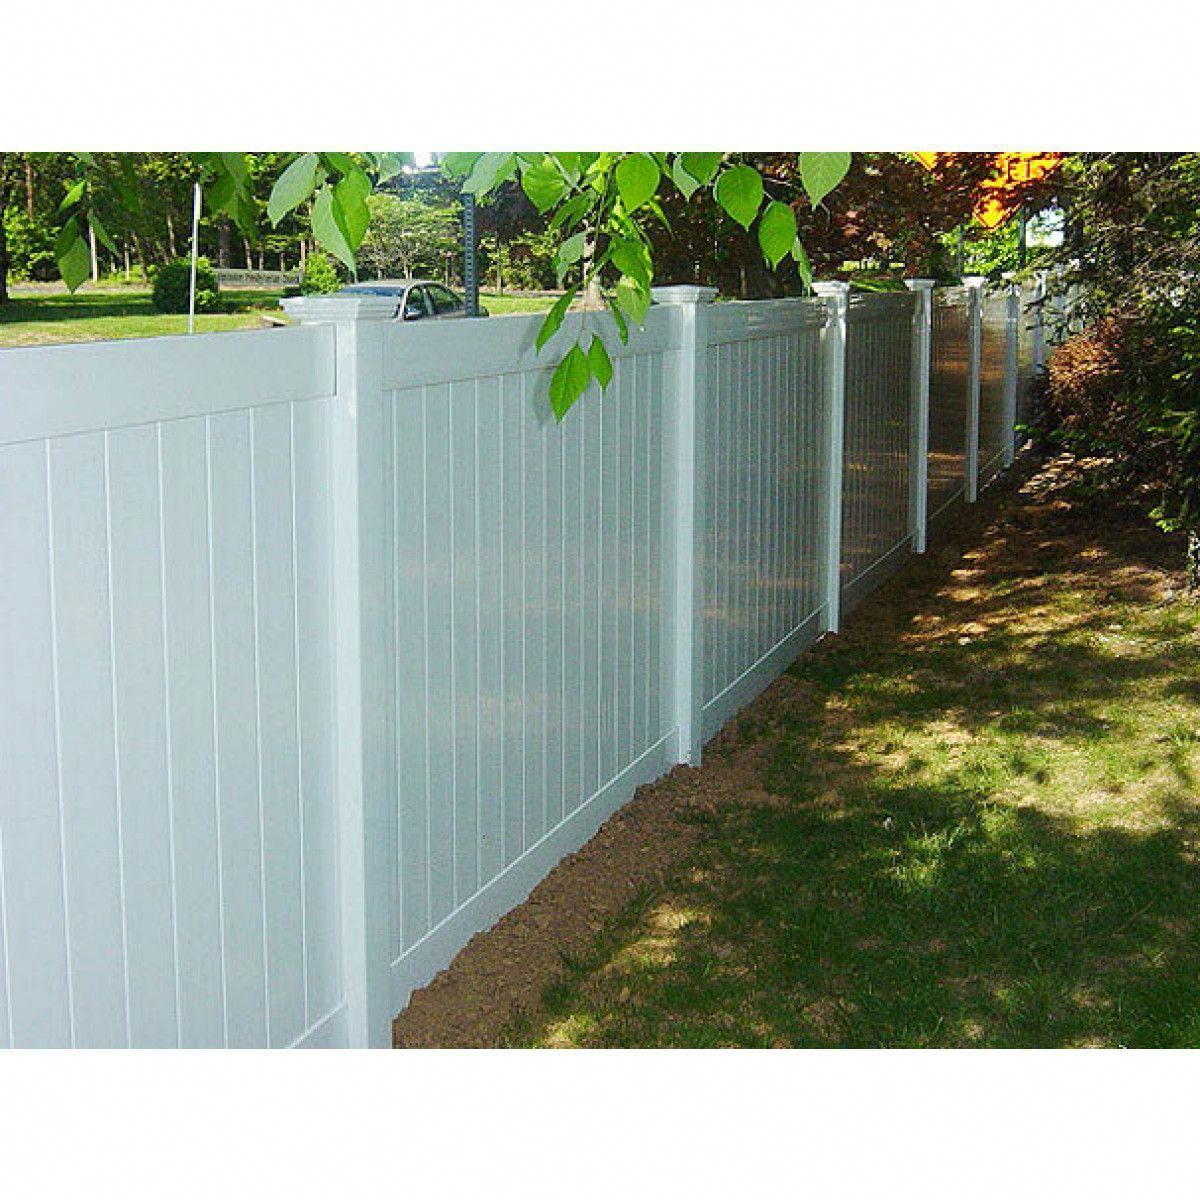 Advantages And Disadvantages Of Indoor Hot Tubs Vs Outdoor Hot Tubs Garden Fence Panels Fence Design Backyard Fences